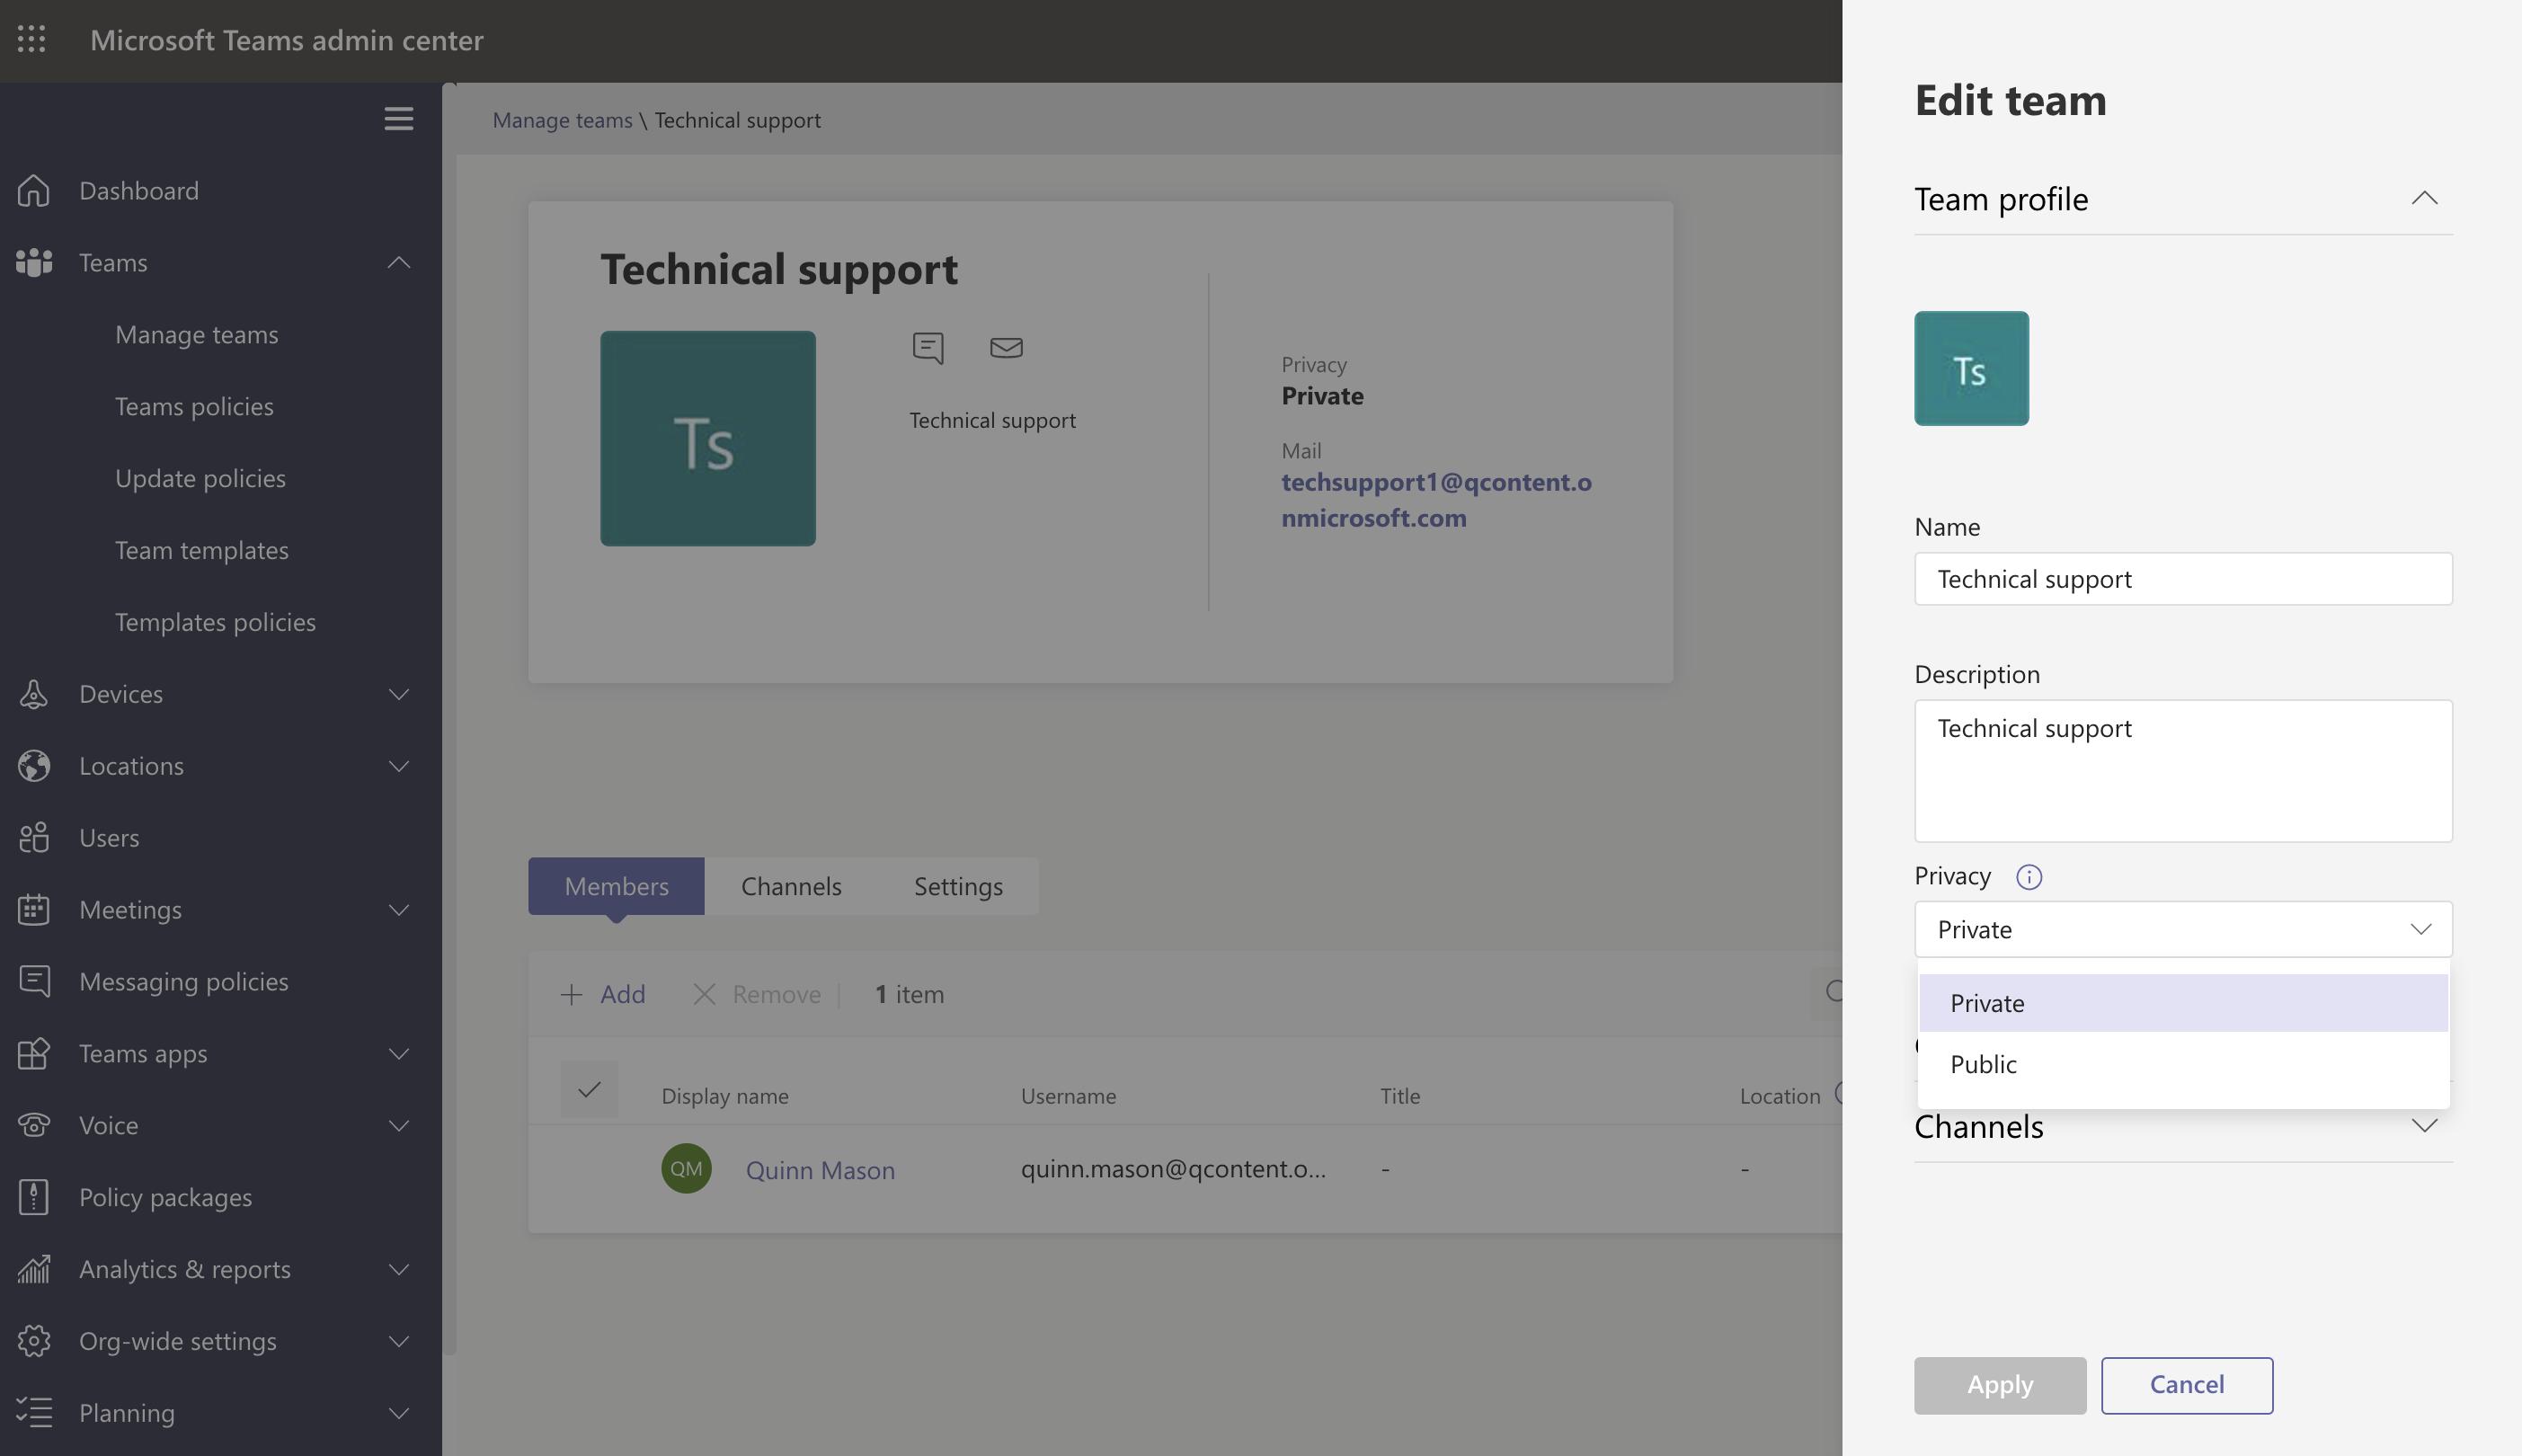 Screenshot of individual team settings in the Teams admin center.